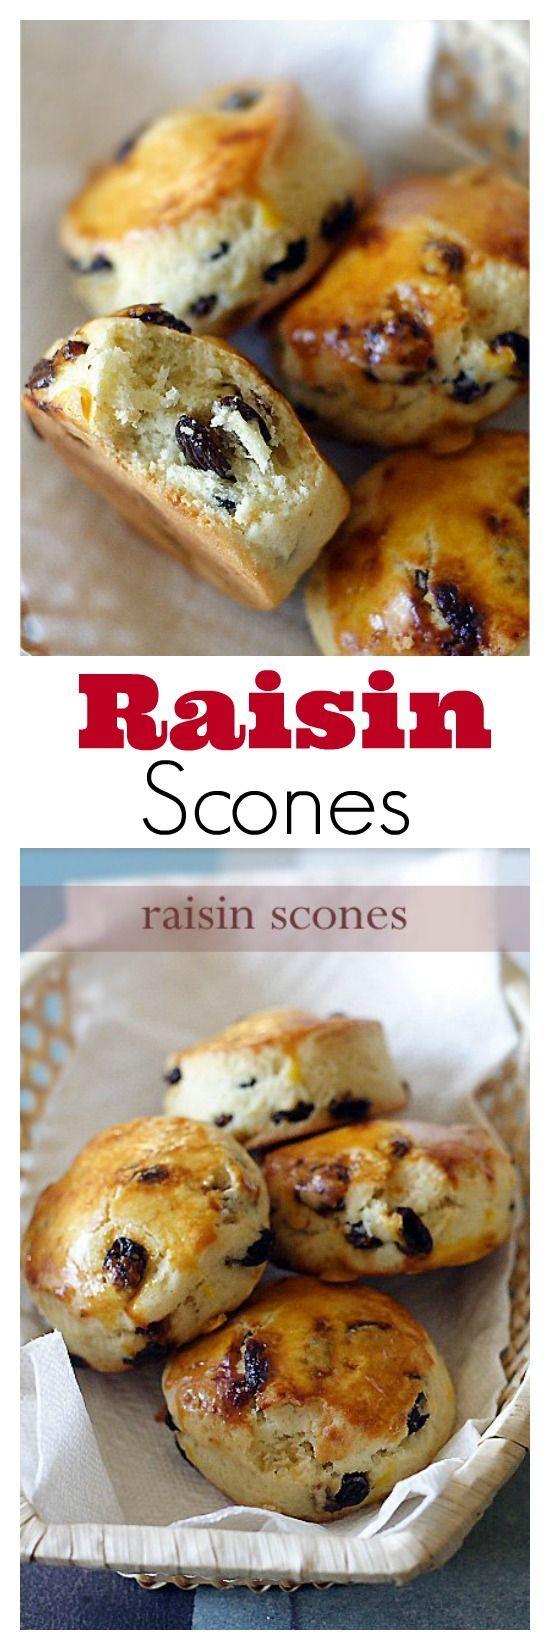 Raisin scones - crumbly, flaky, buttery, and the best raisin scones ever. Try the recipe | rasamalaysia.com